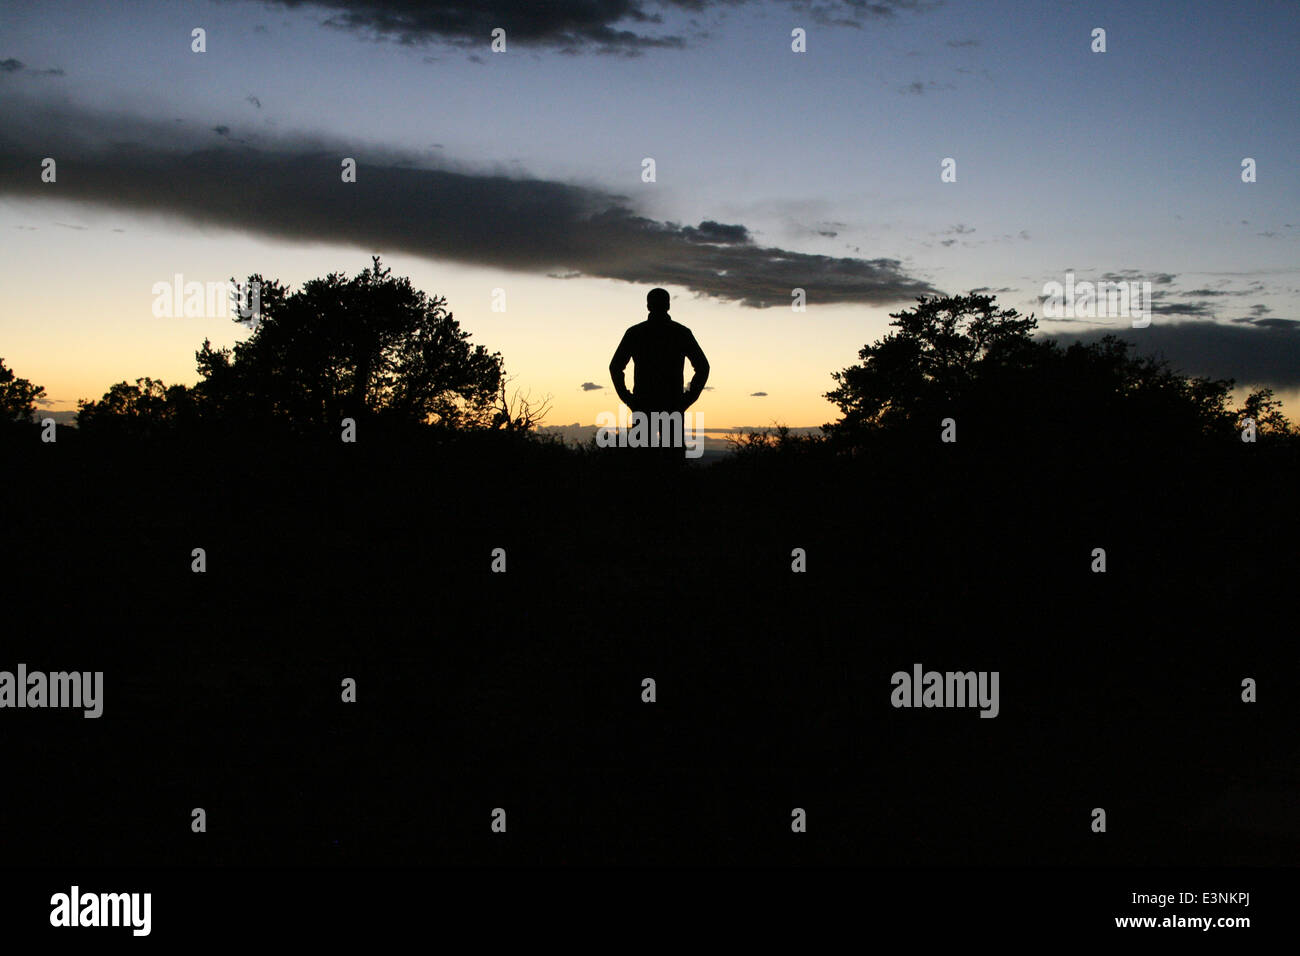 Silhouette Sonnenuntergang - Stock Image